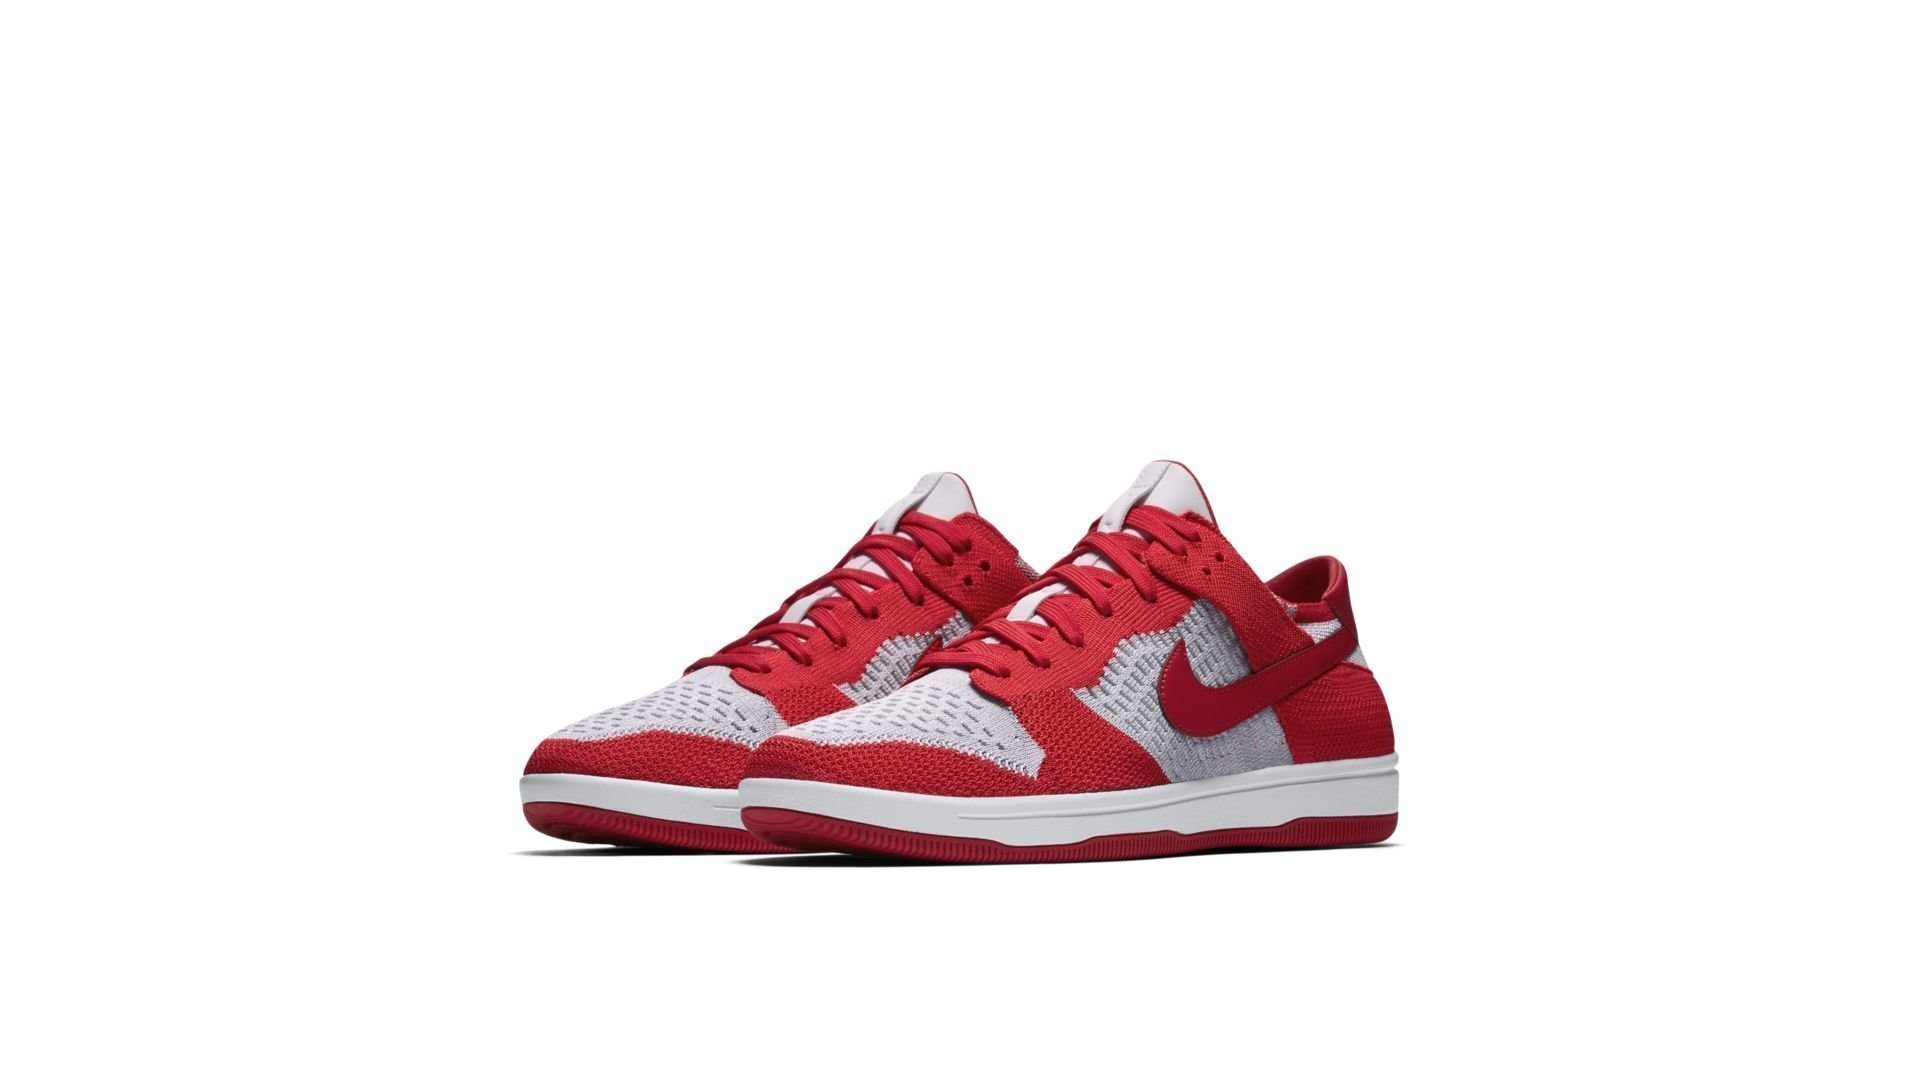 Nike Dunk Low Flyknit University Red Wolf Grey (917746-600)